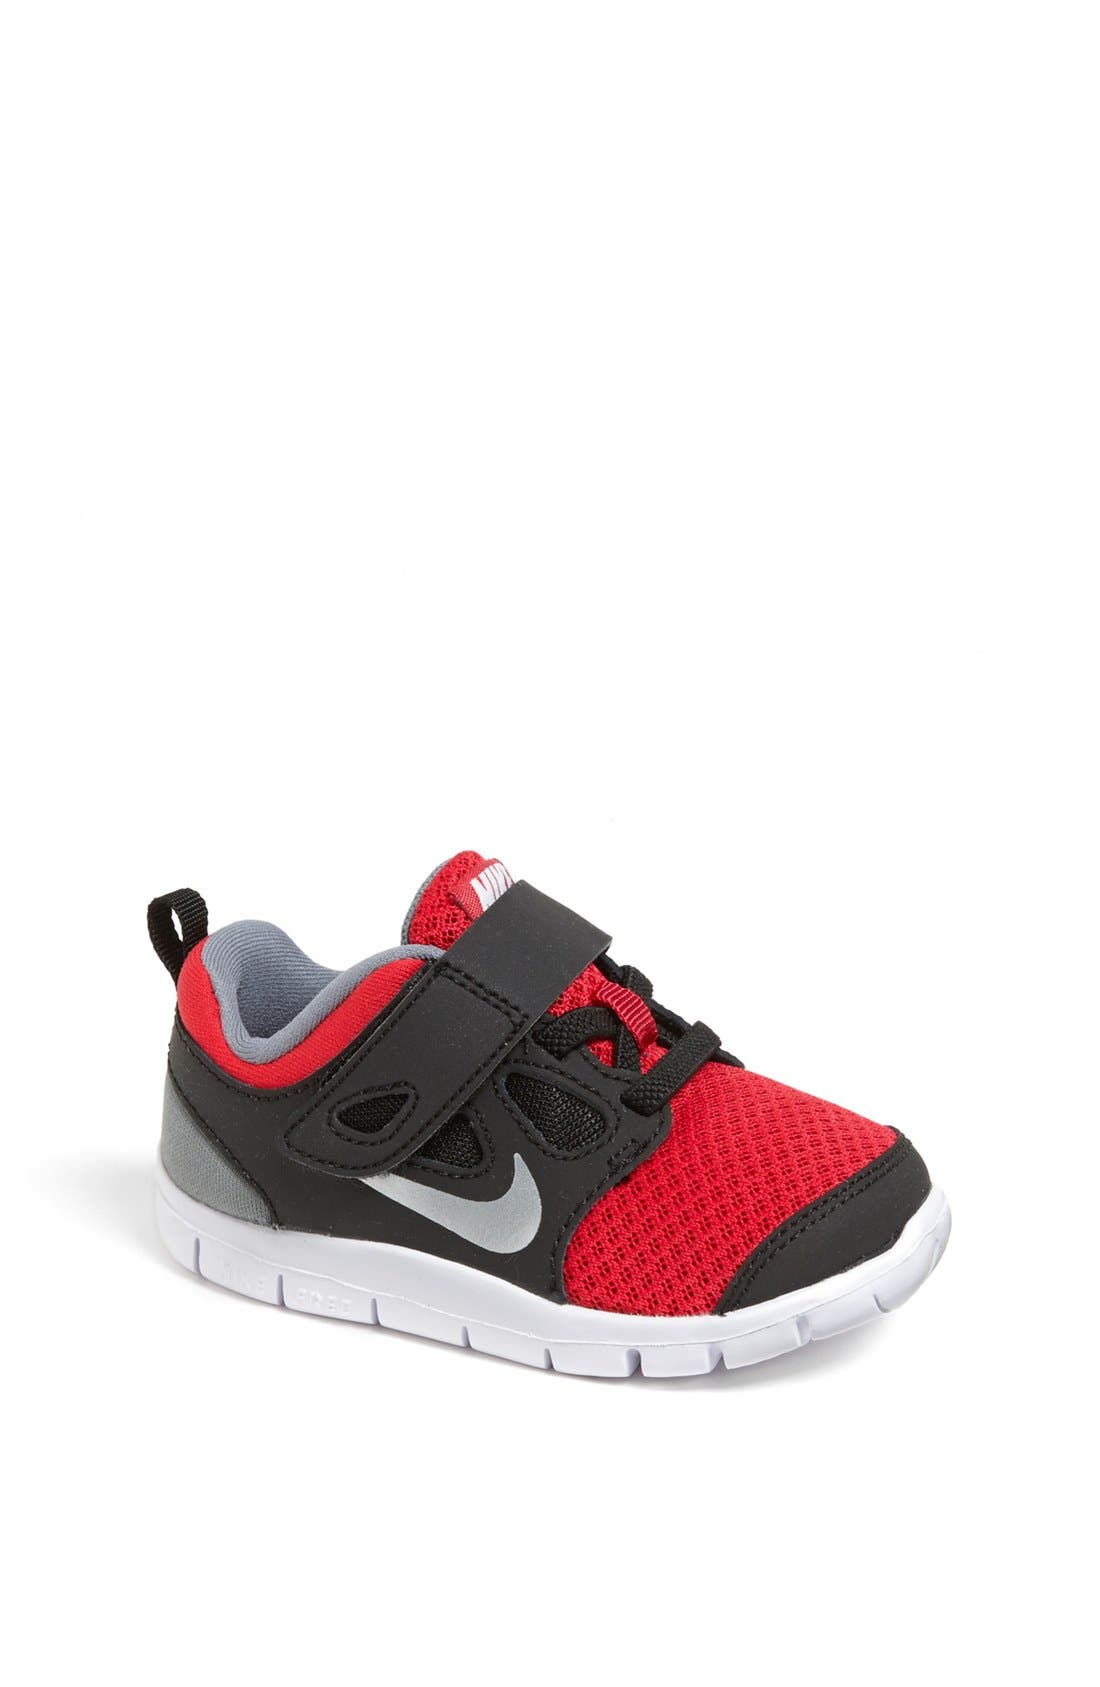 Alternate Image 1 Selected - Nike 'Free Run 5.0' Sneaker (Baby, Walker & Toddler)